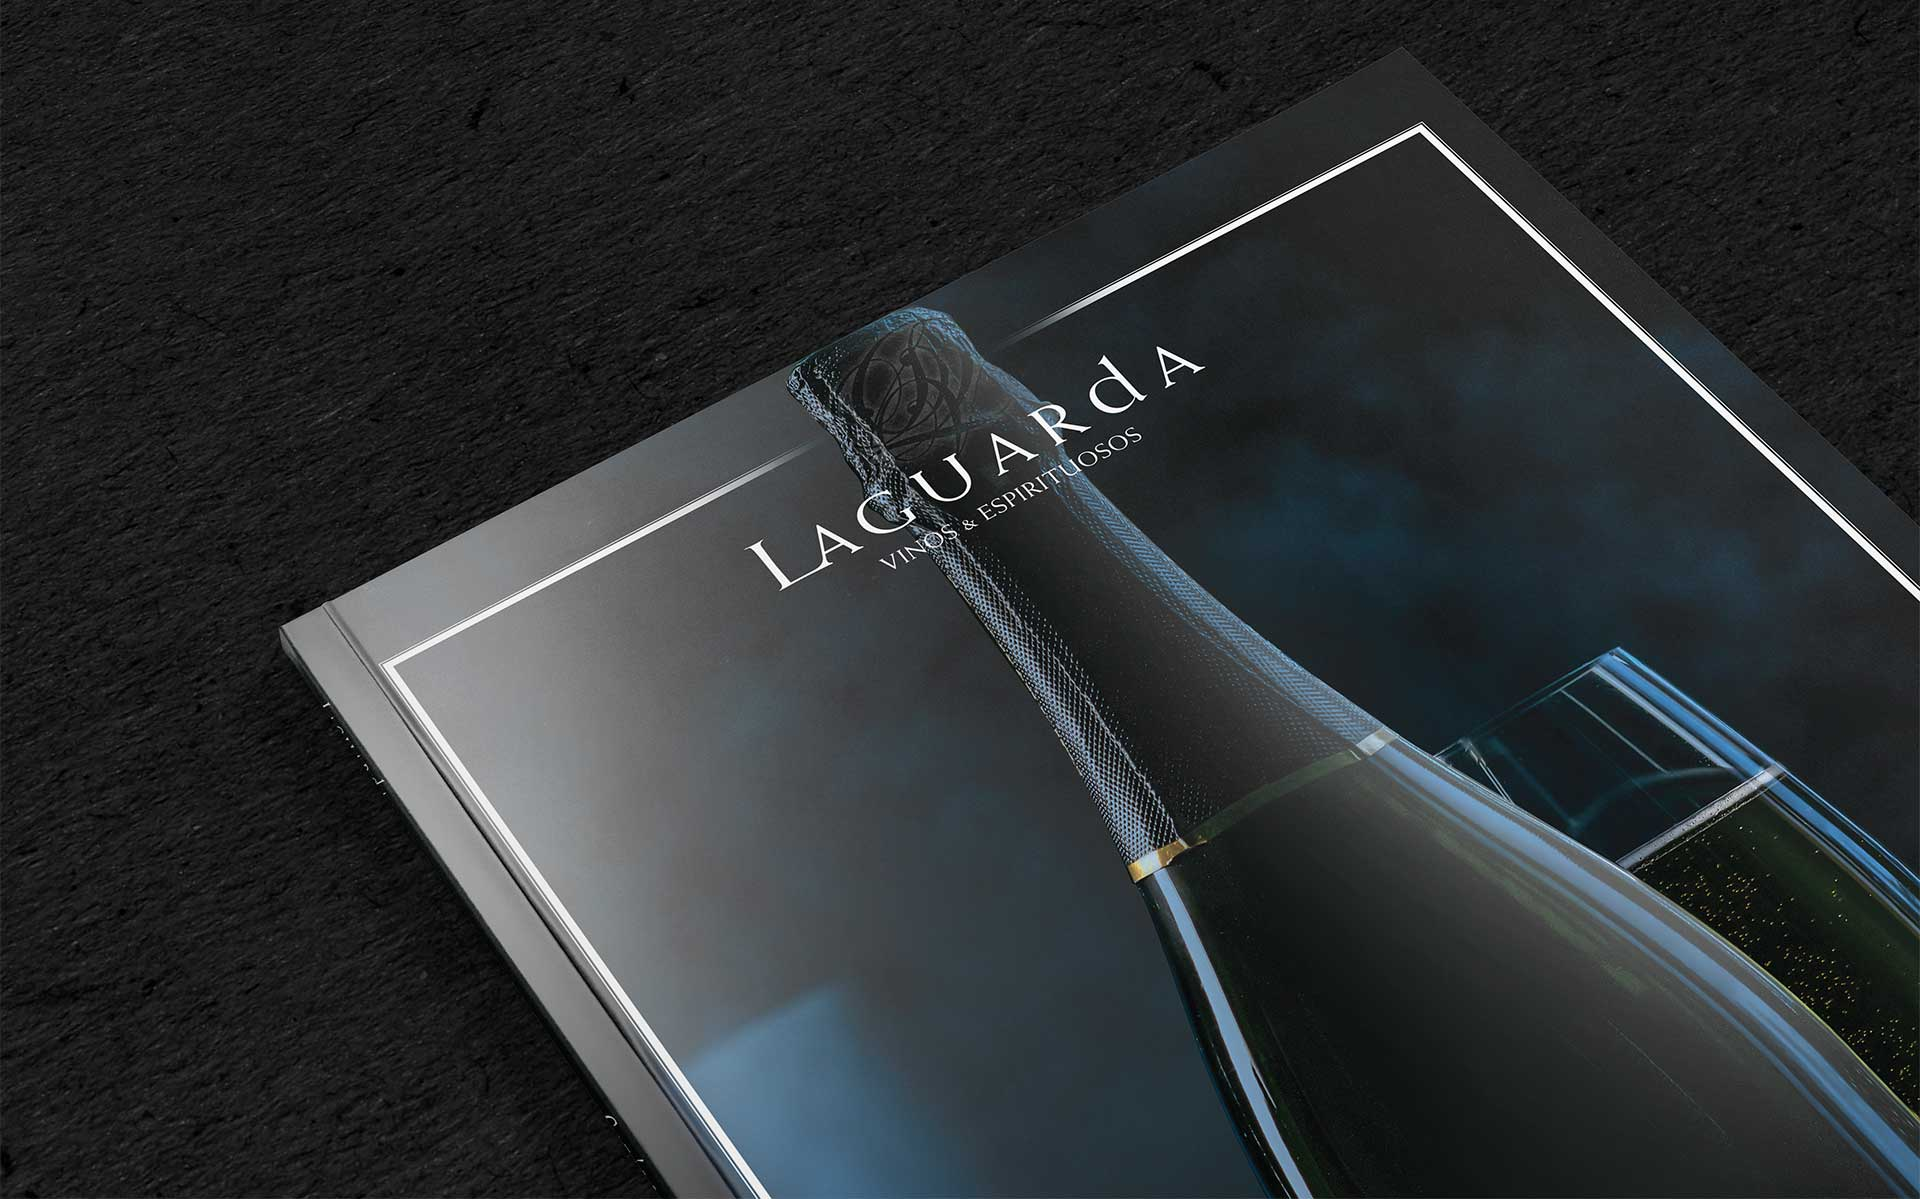 cover_laguarda2017_01.jpg